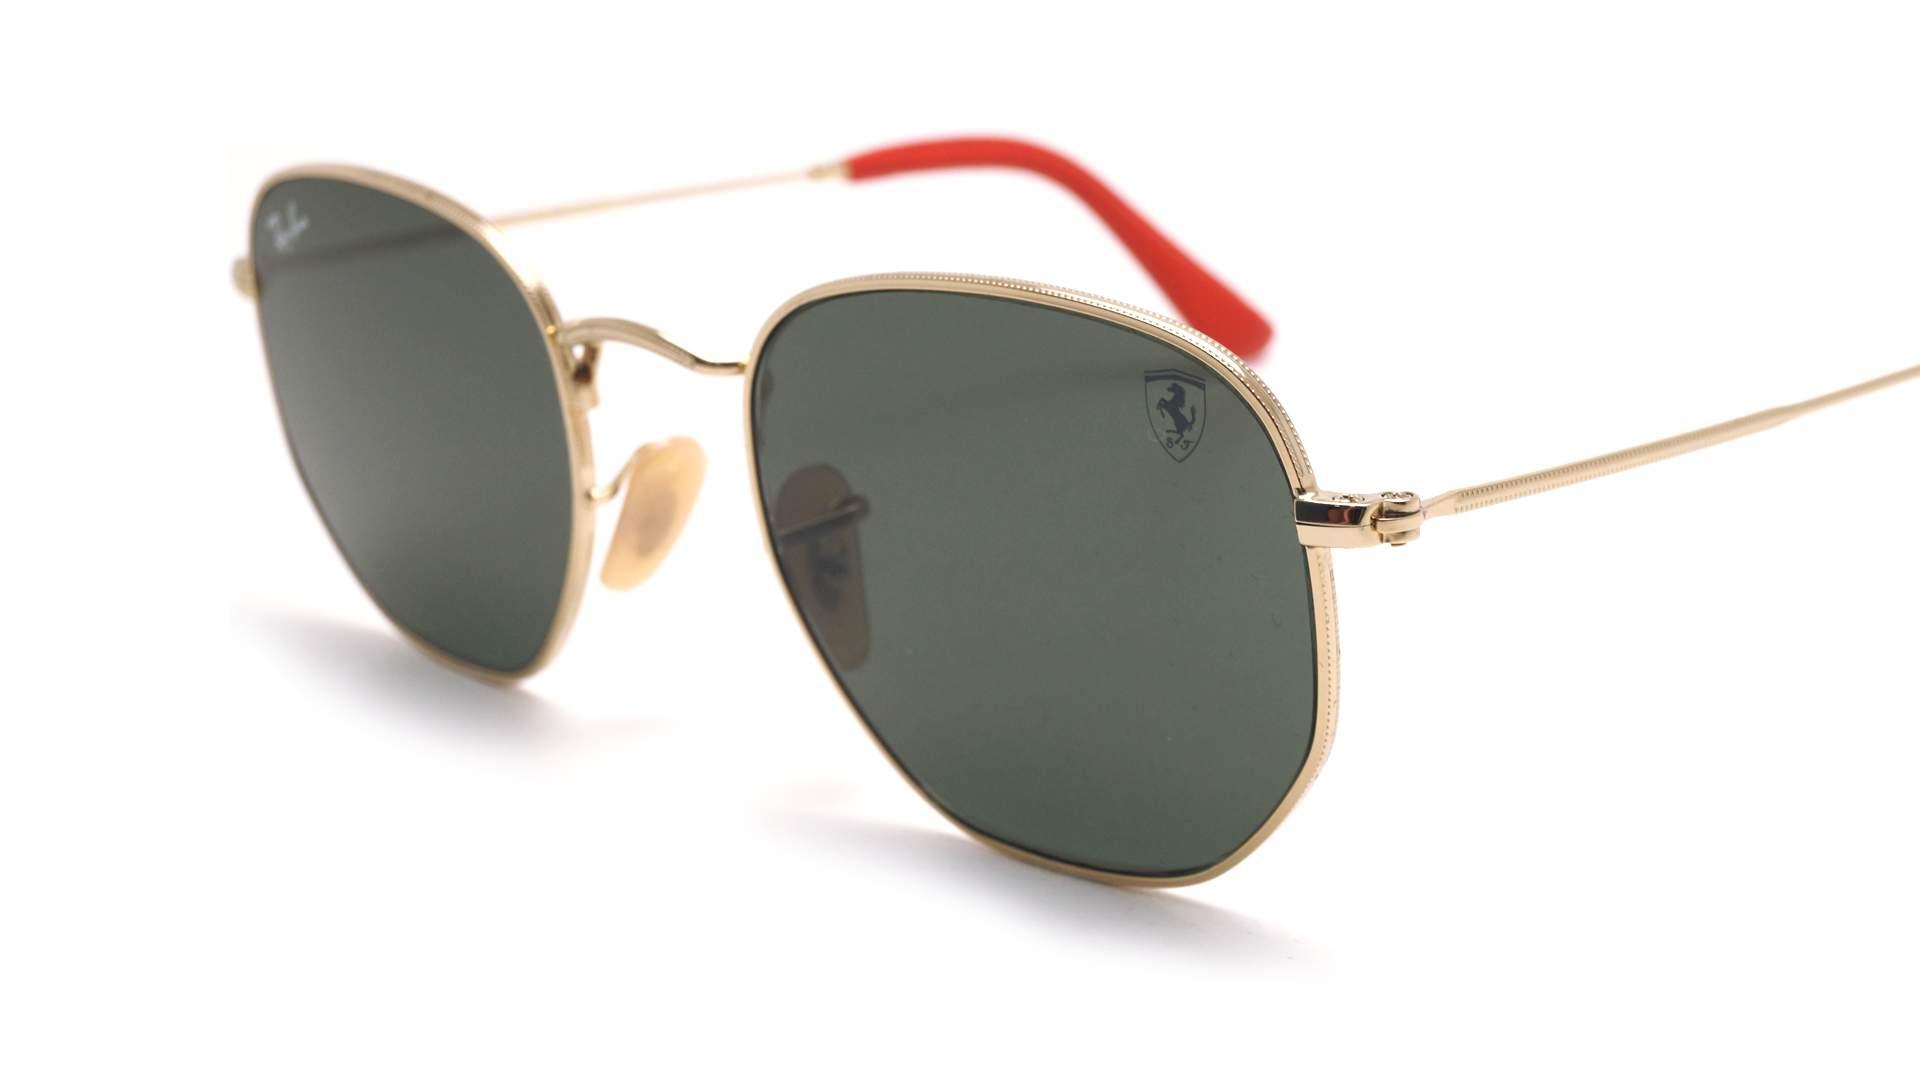 29b26fadf Sunglasses Ray-Ban Hexagonal Scuderia Ferrari Gold G-15 RB3548NM F008/31  51-21 Medium